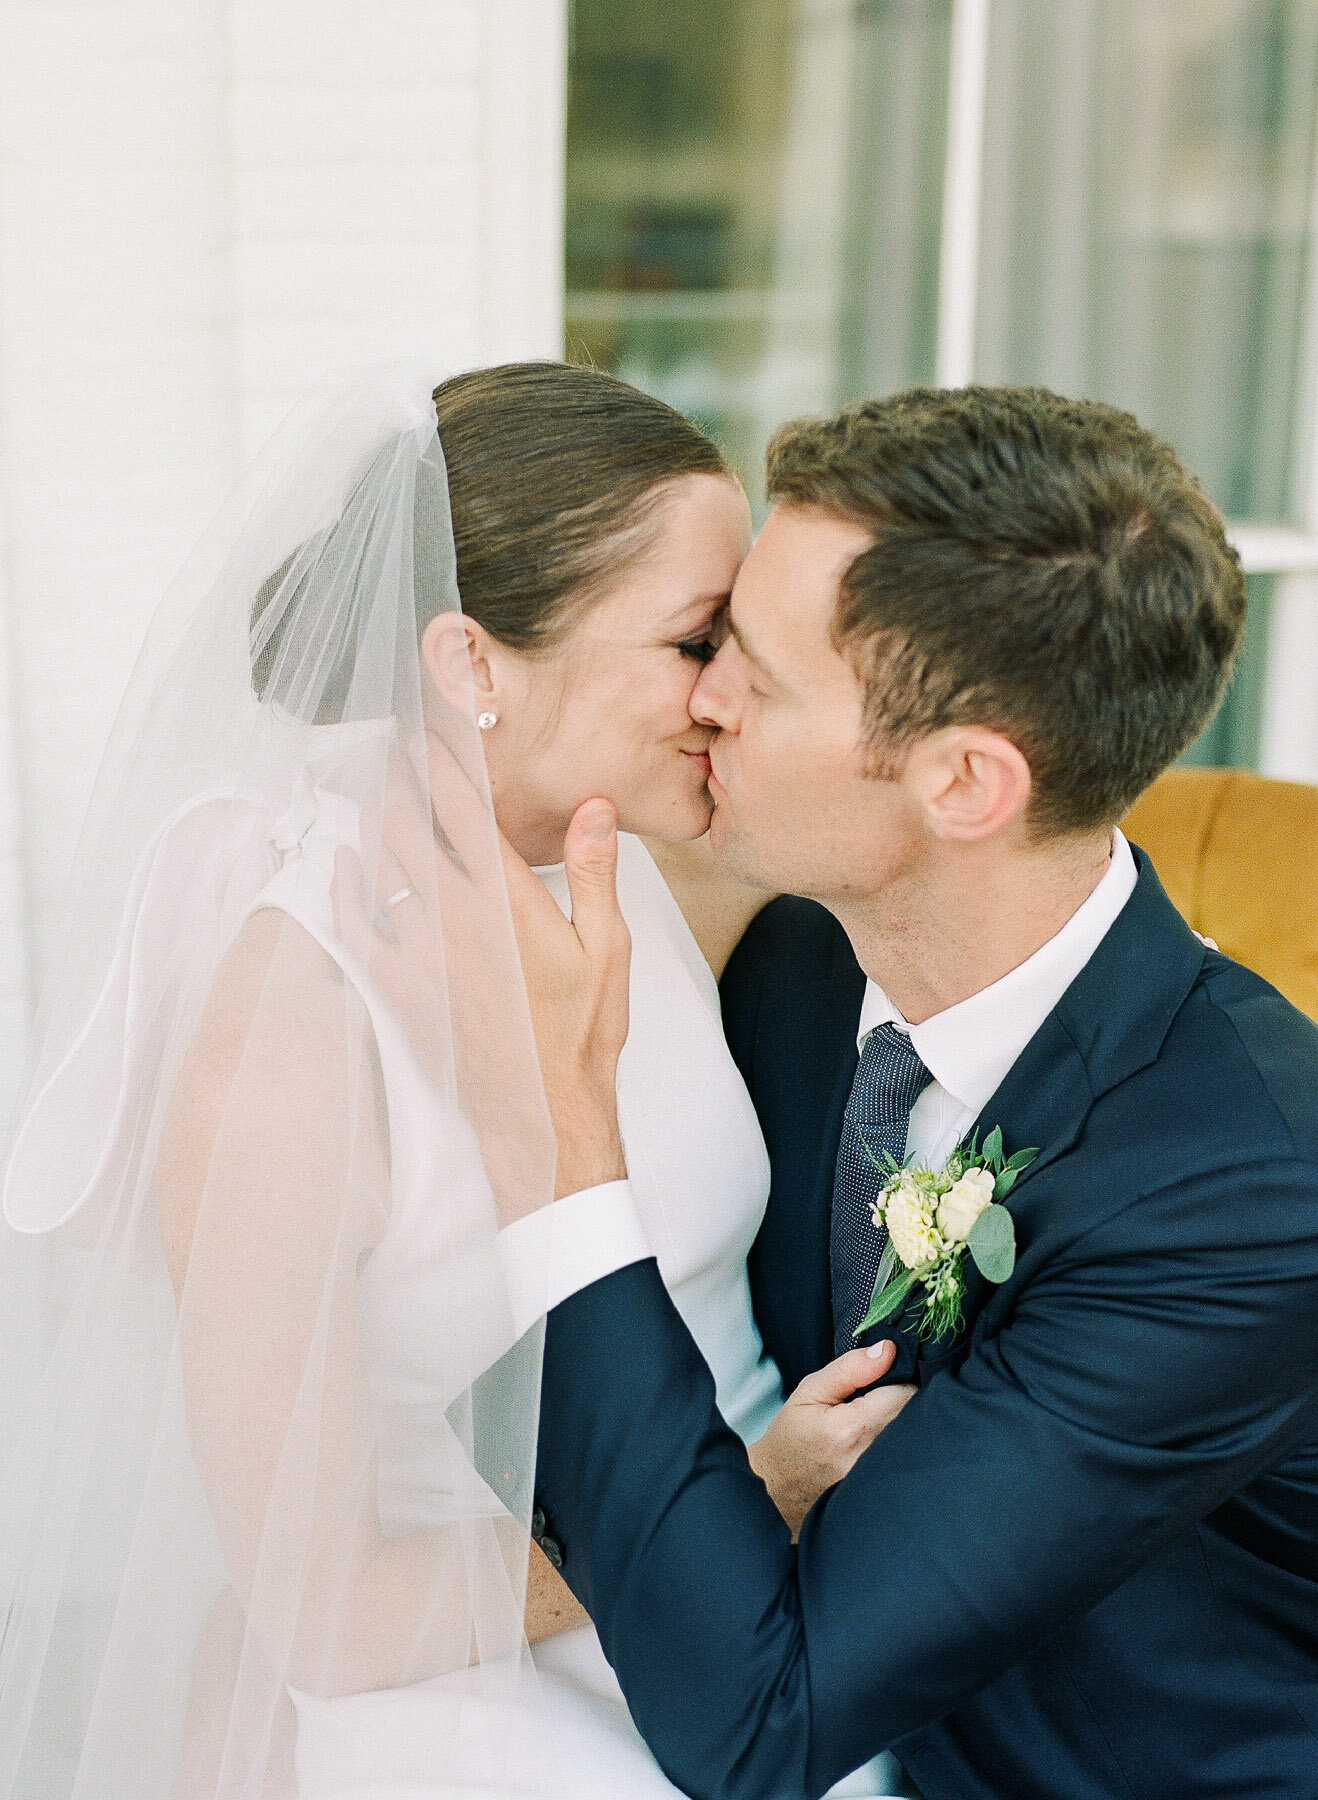 Adelphi Saratoga Wedding by Michelle Lange Photography-63.jpg